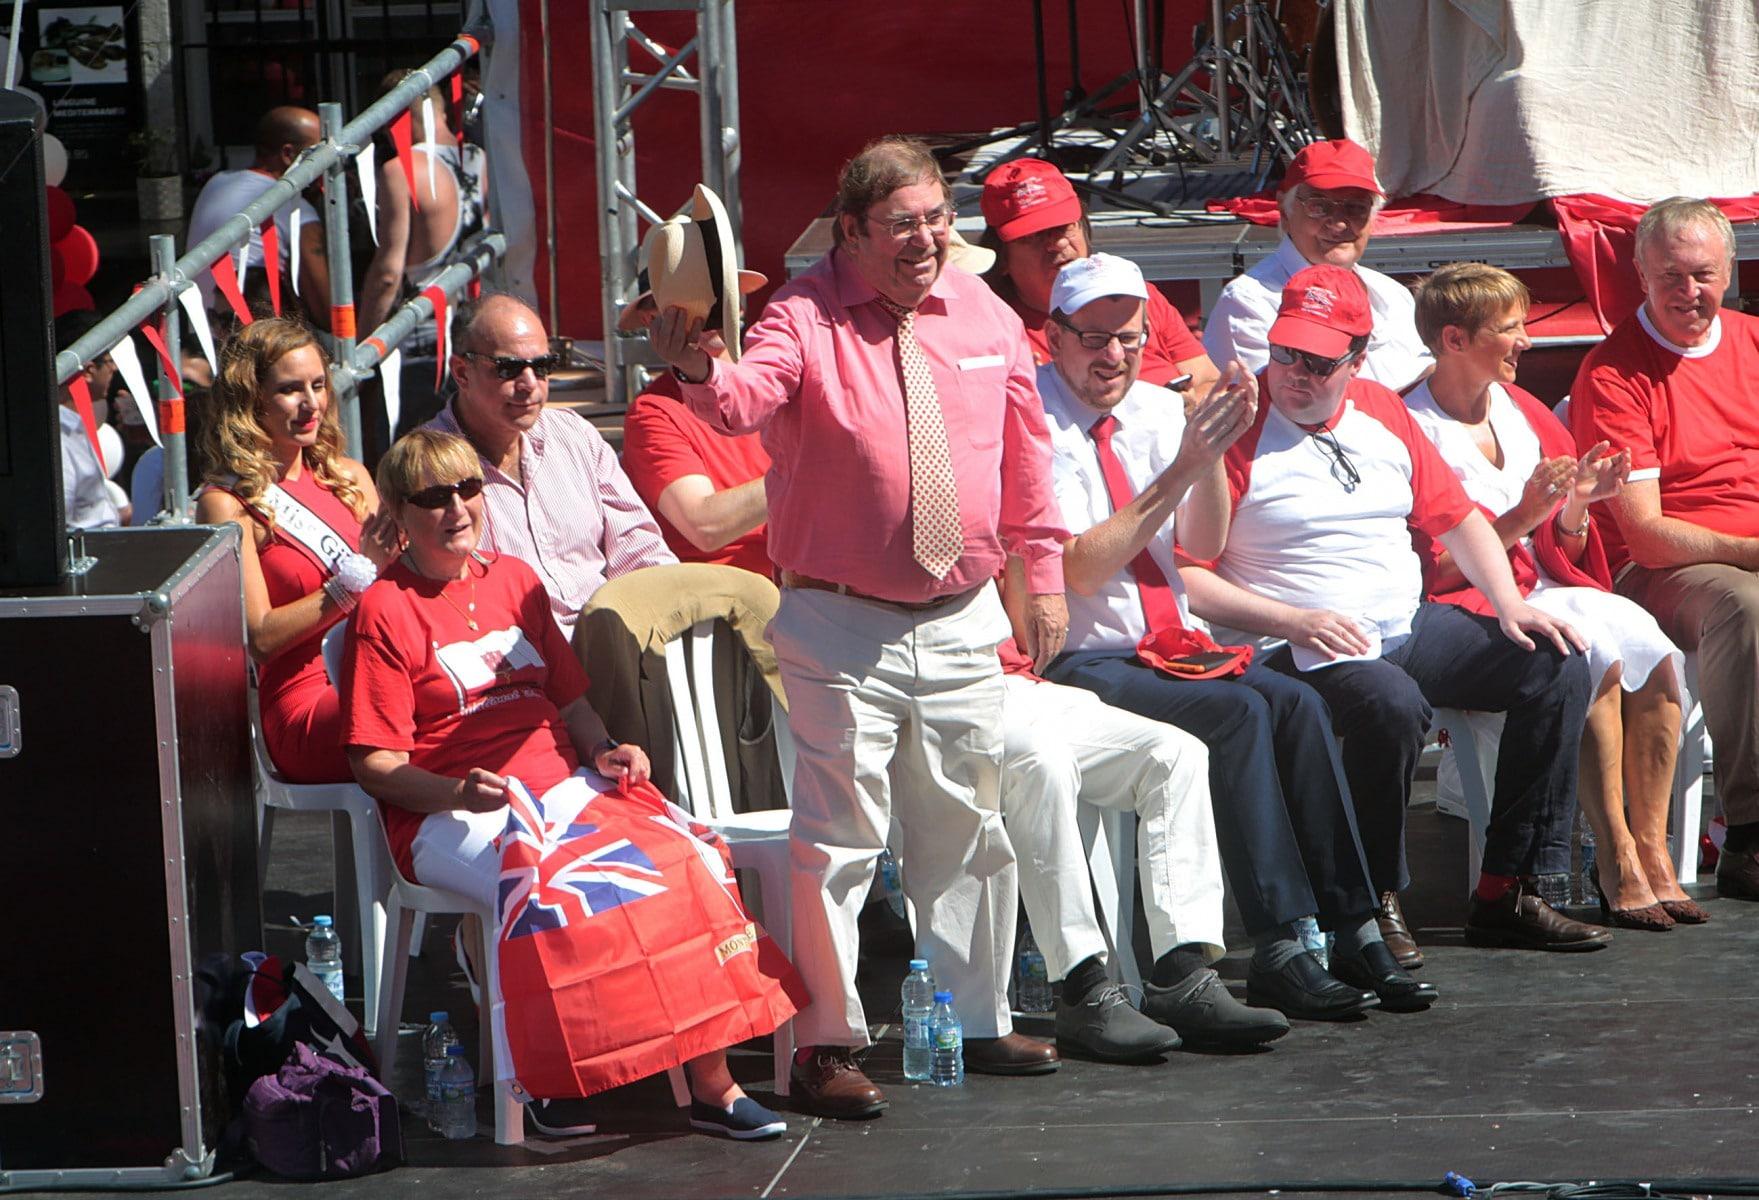 160910-national-day-gibraltar-2016-3_29605163365_o